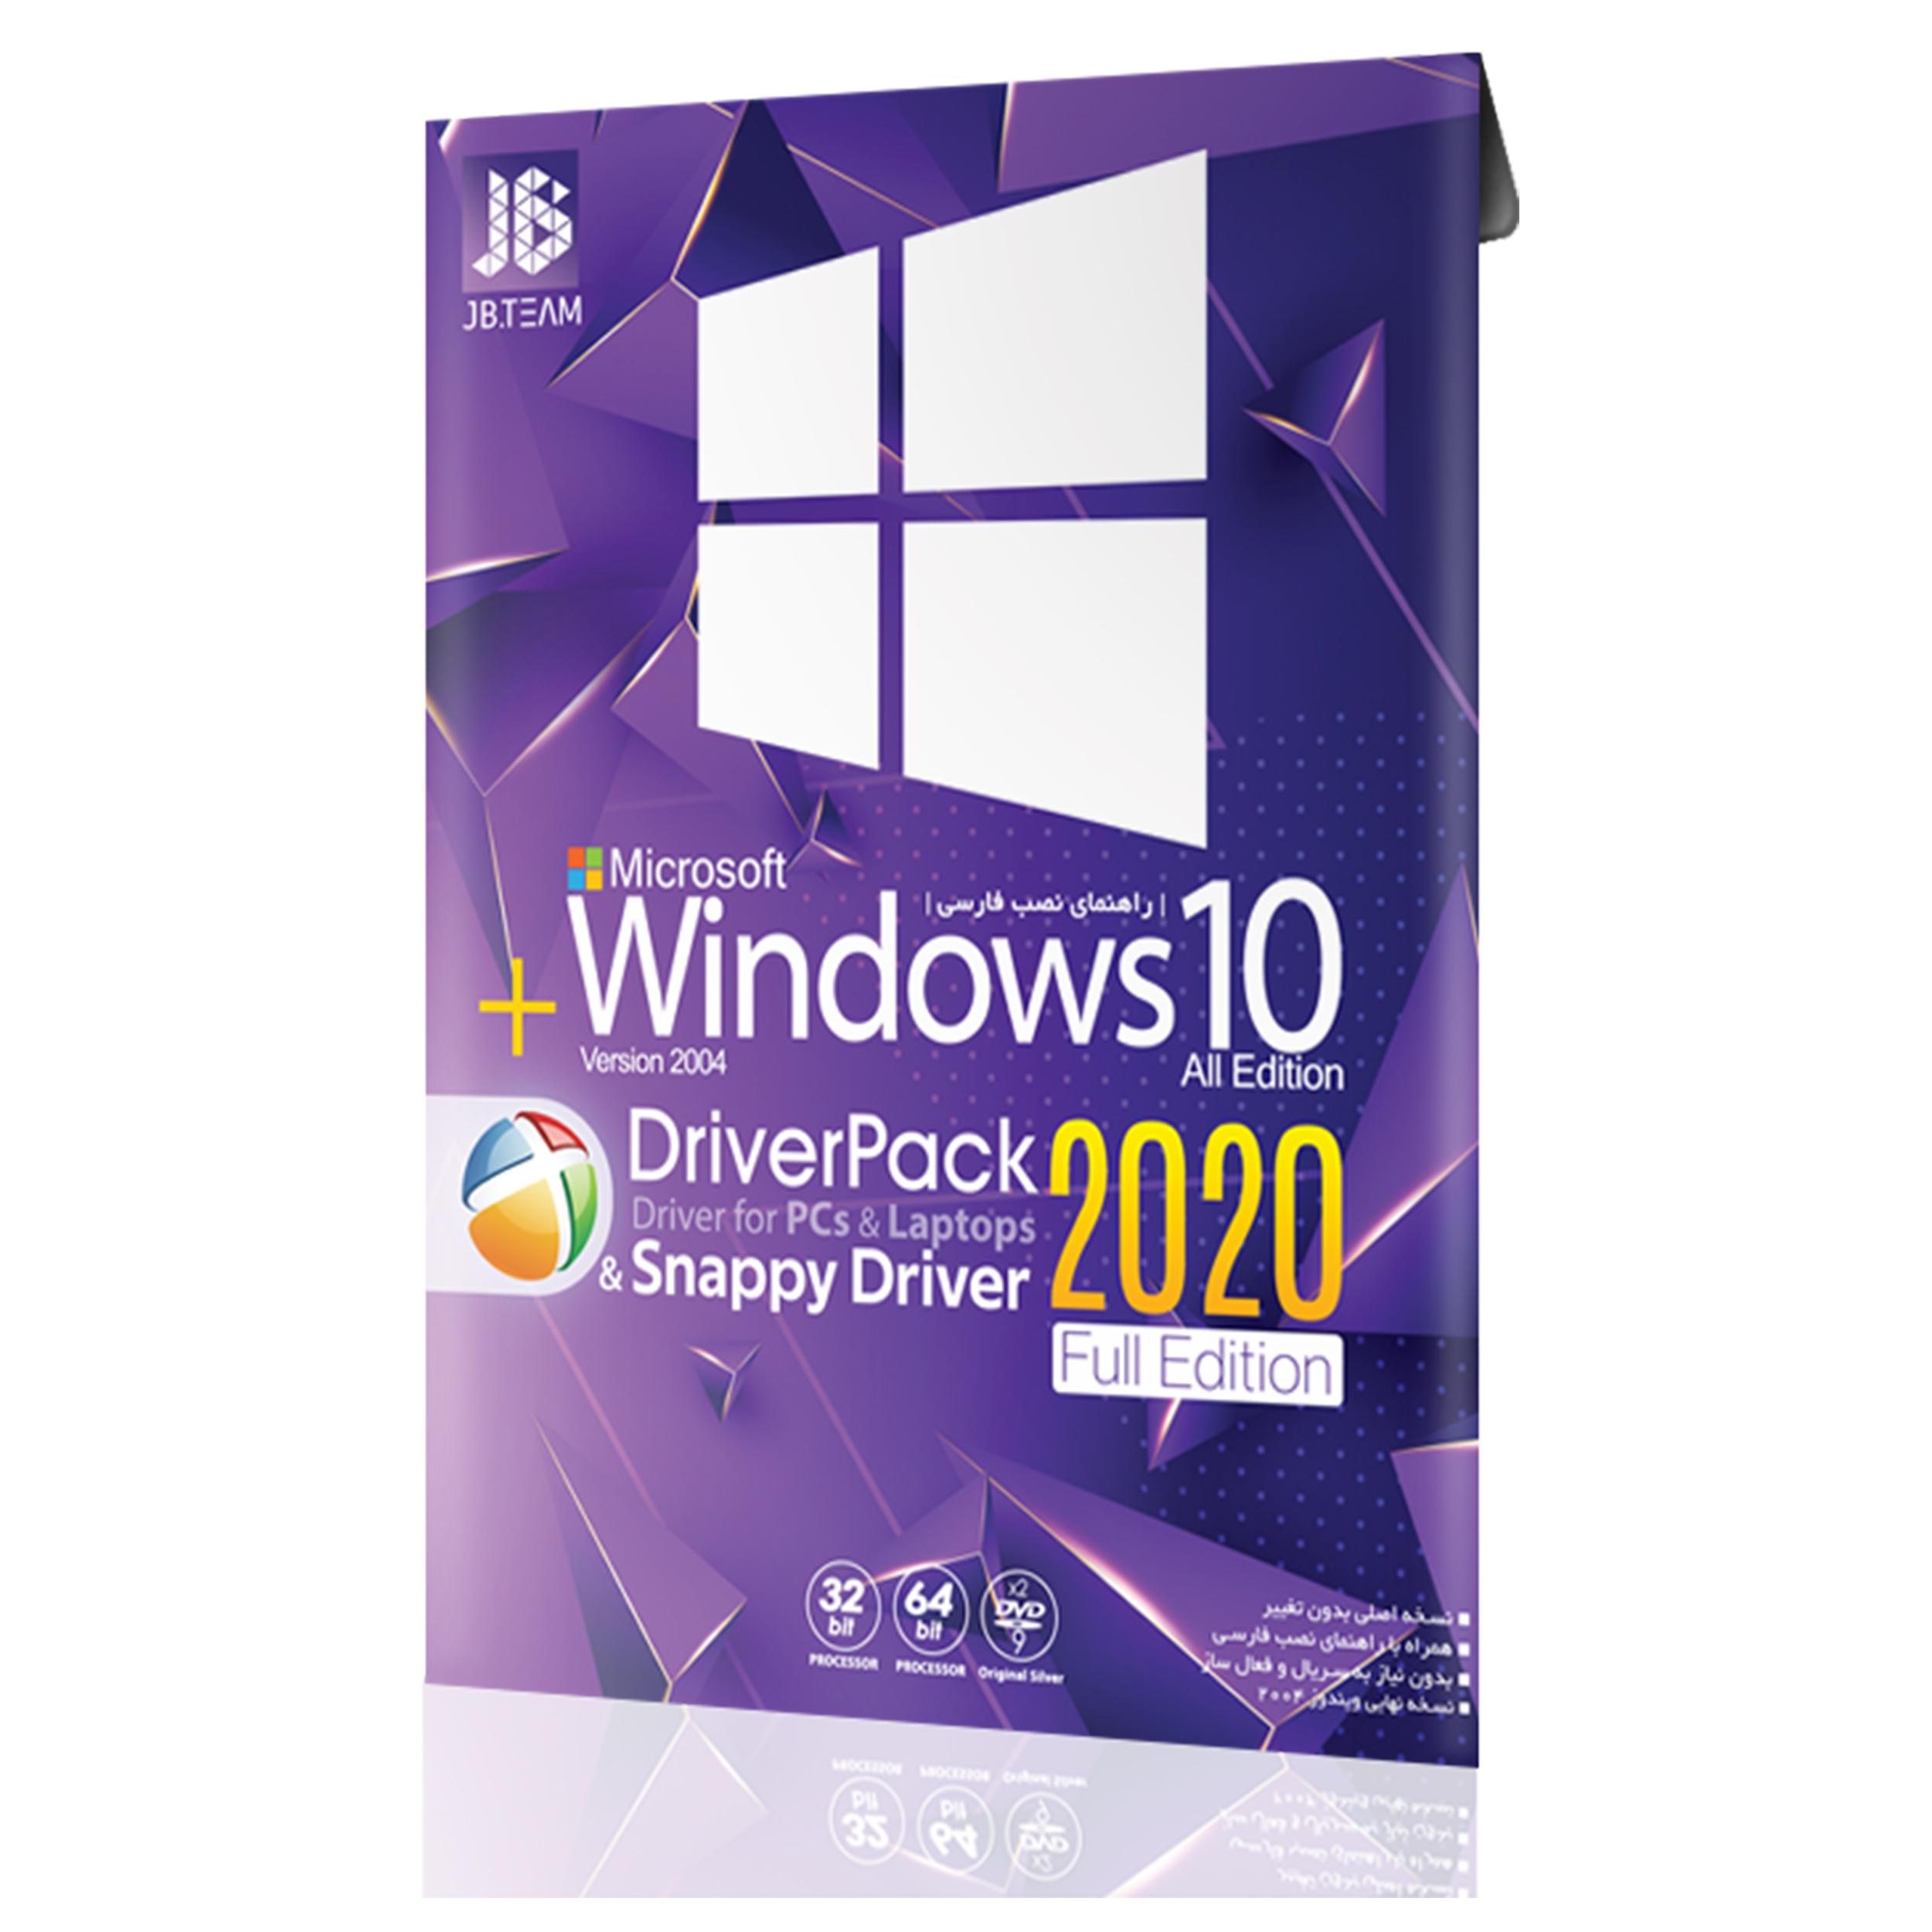 سیستم عامل Windows 10 + Driver Pack 2020 نشر جی بی تیم